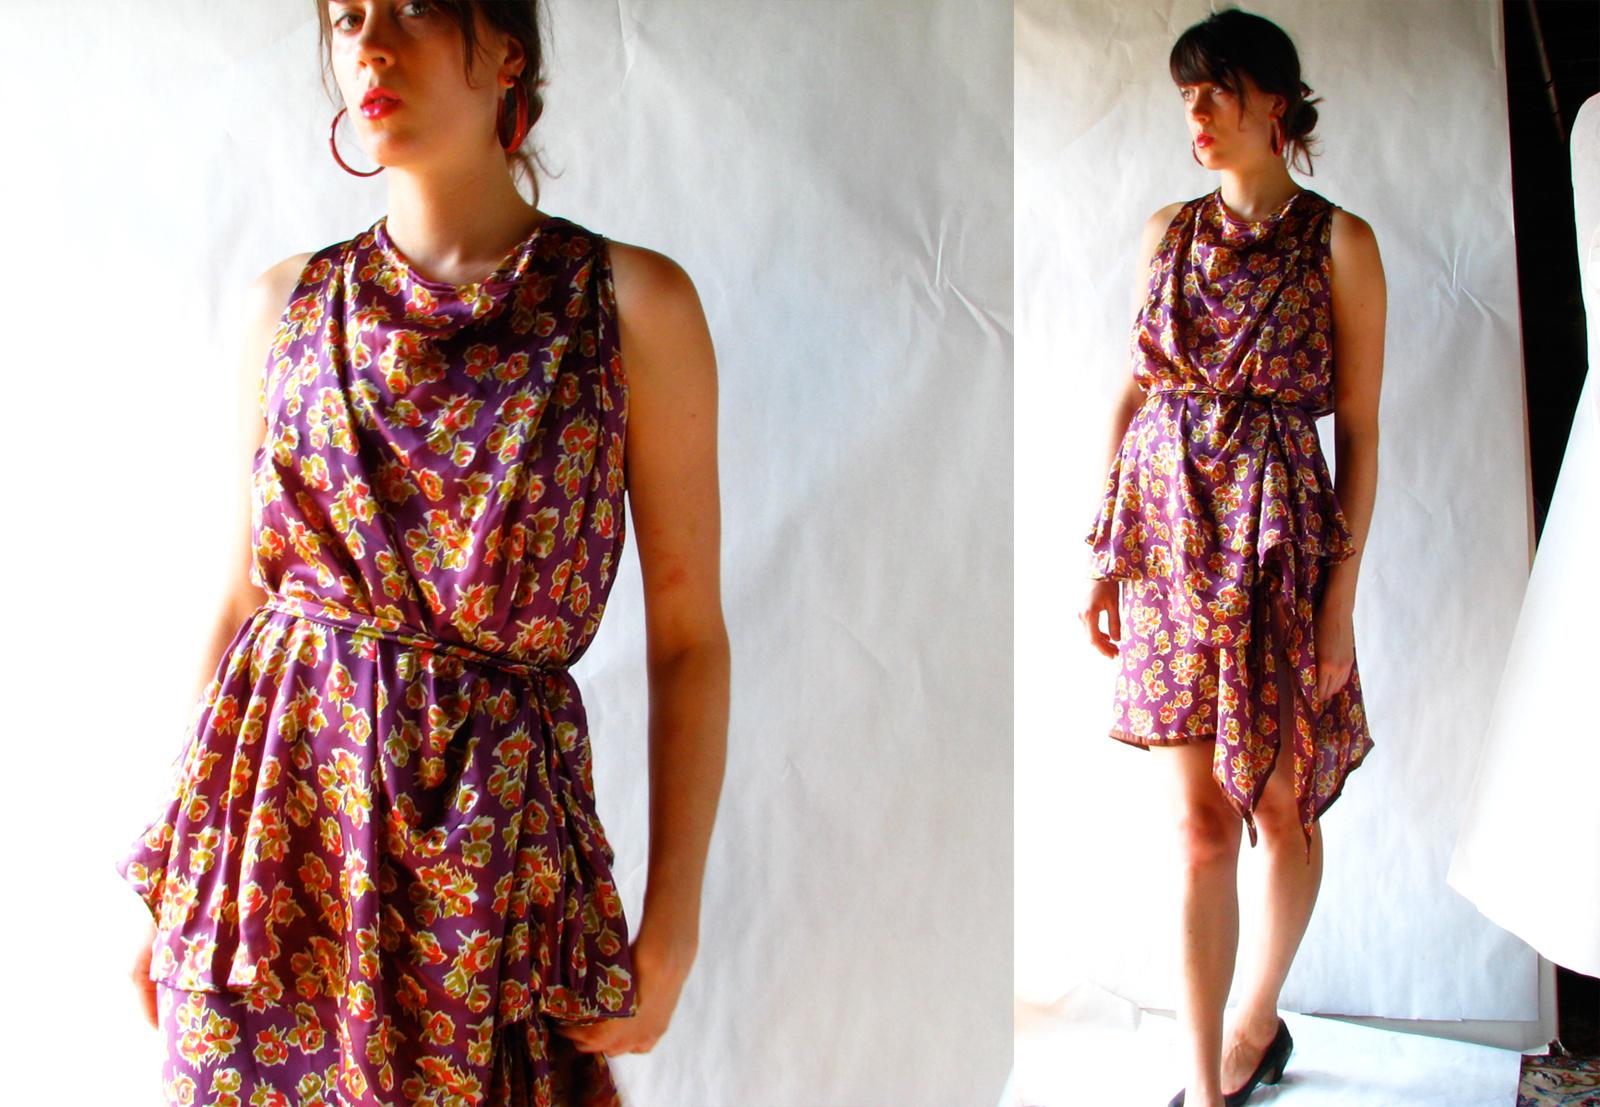 los-angeles-dress-silk-set_3773252066_o.jpg